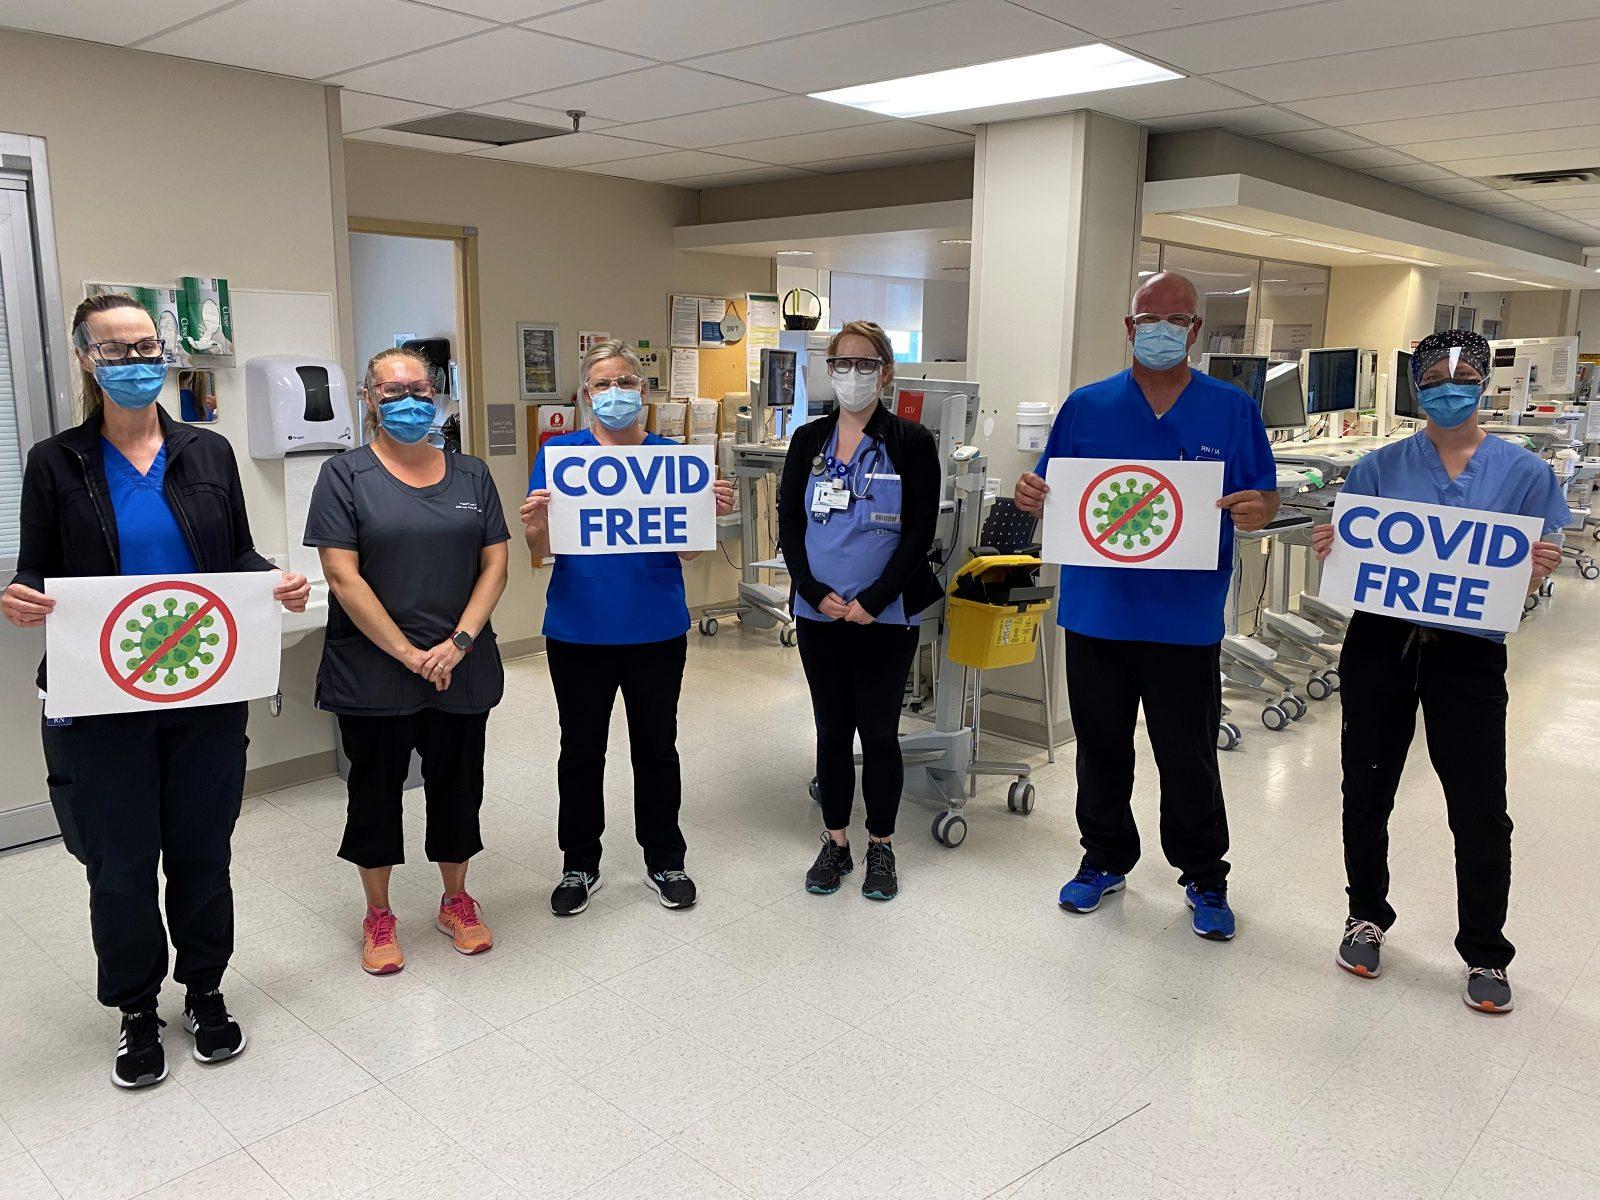 Zero active COVID-19 cases at CCH